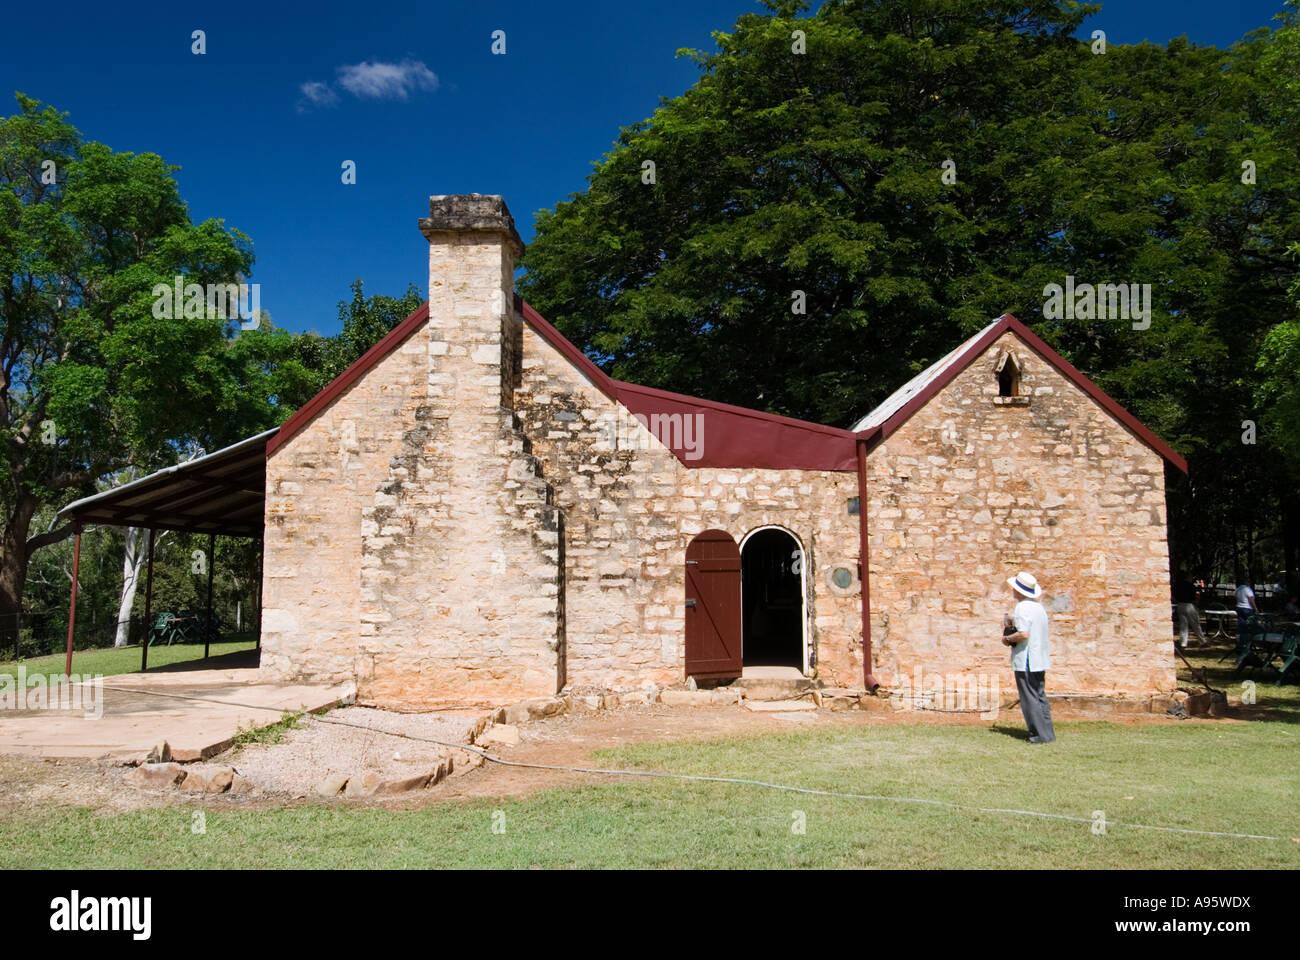 Springvale Homestead preserved outback farm building in Katherine New Territories Australia 2007 - Stock Image